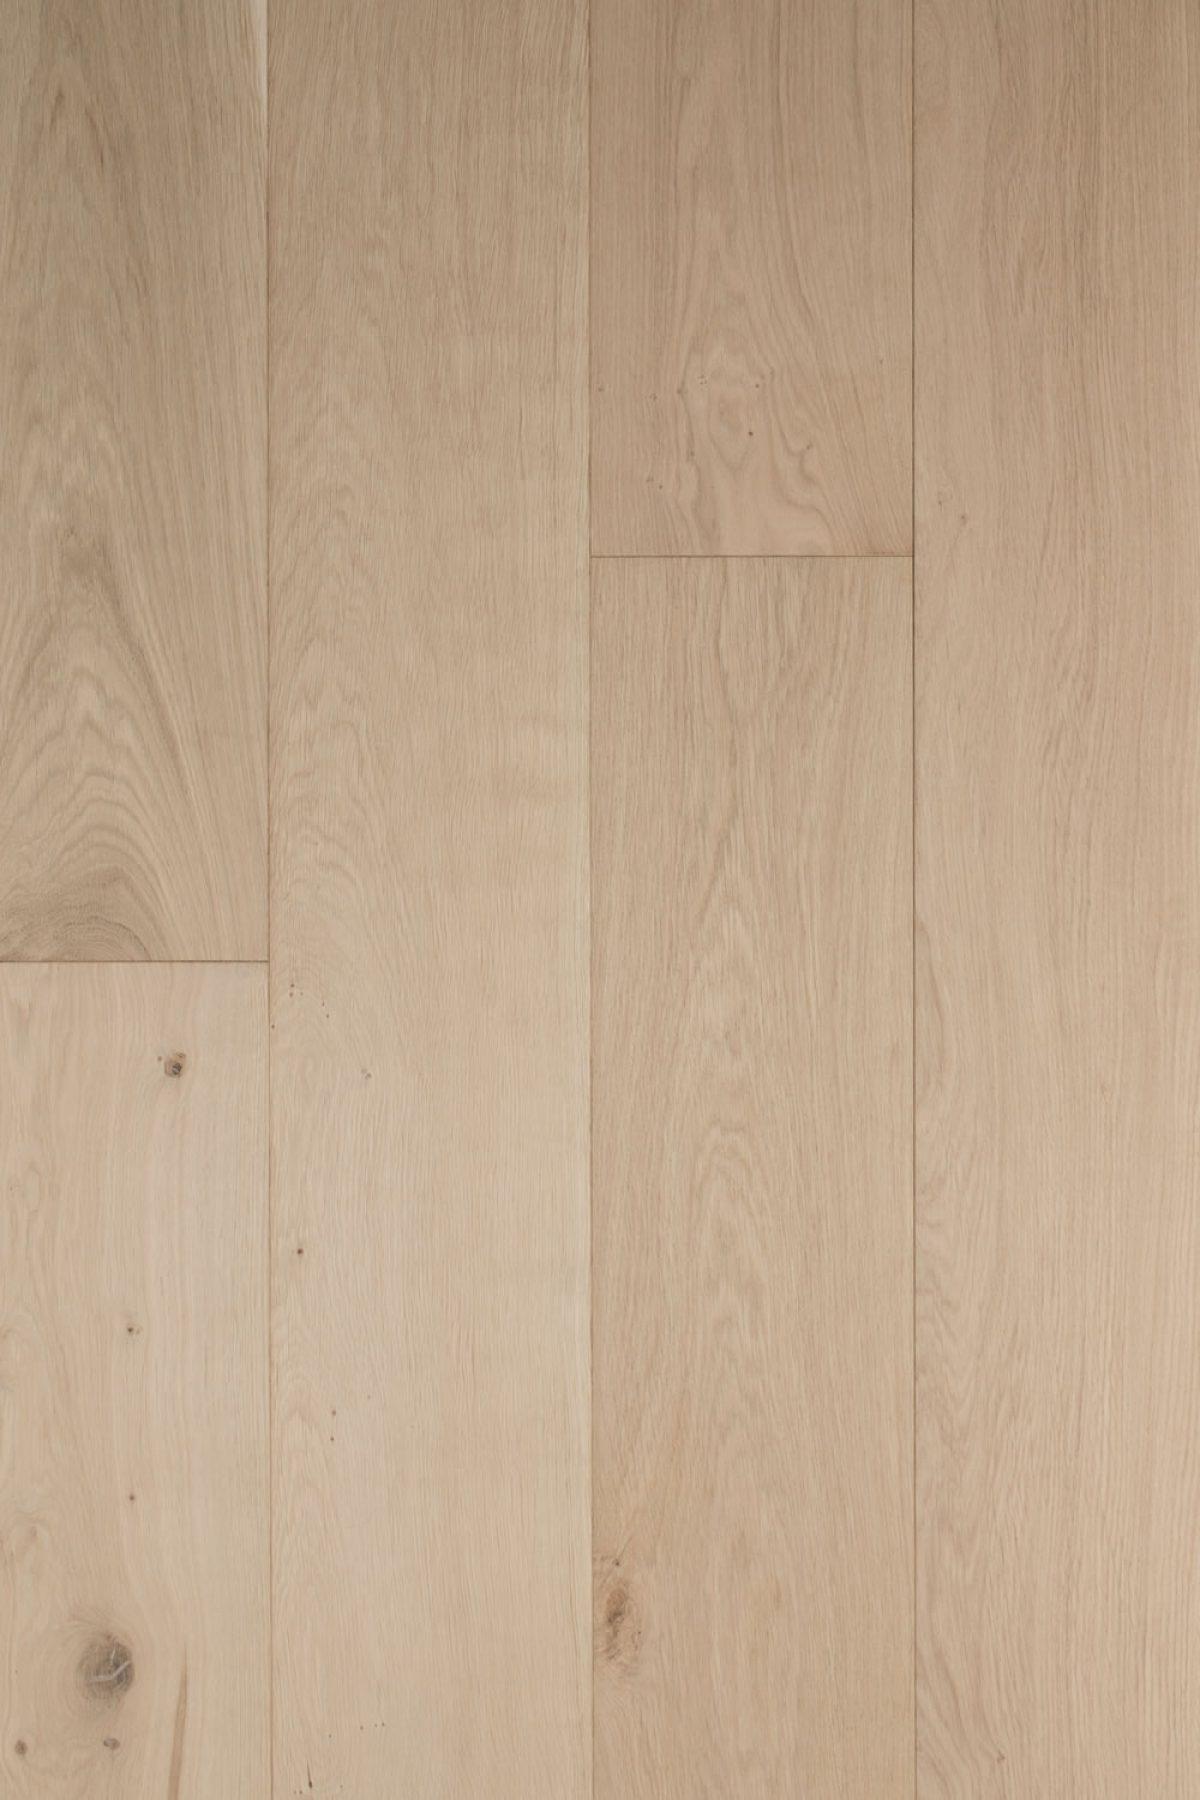 X189 Unfinished Mixed Grade Oak Flooring